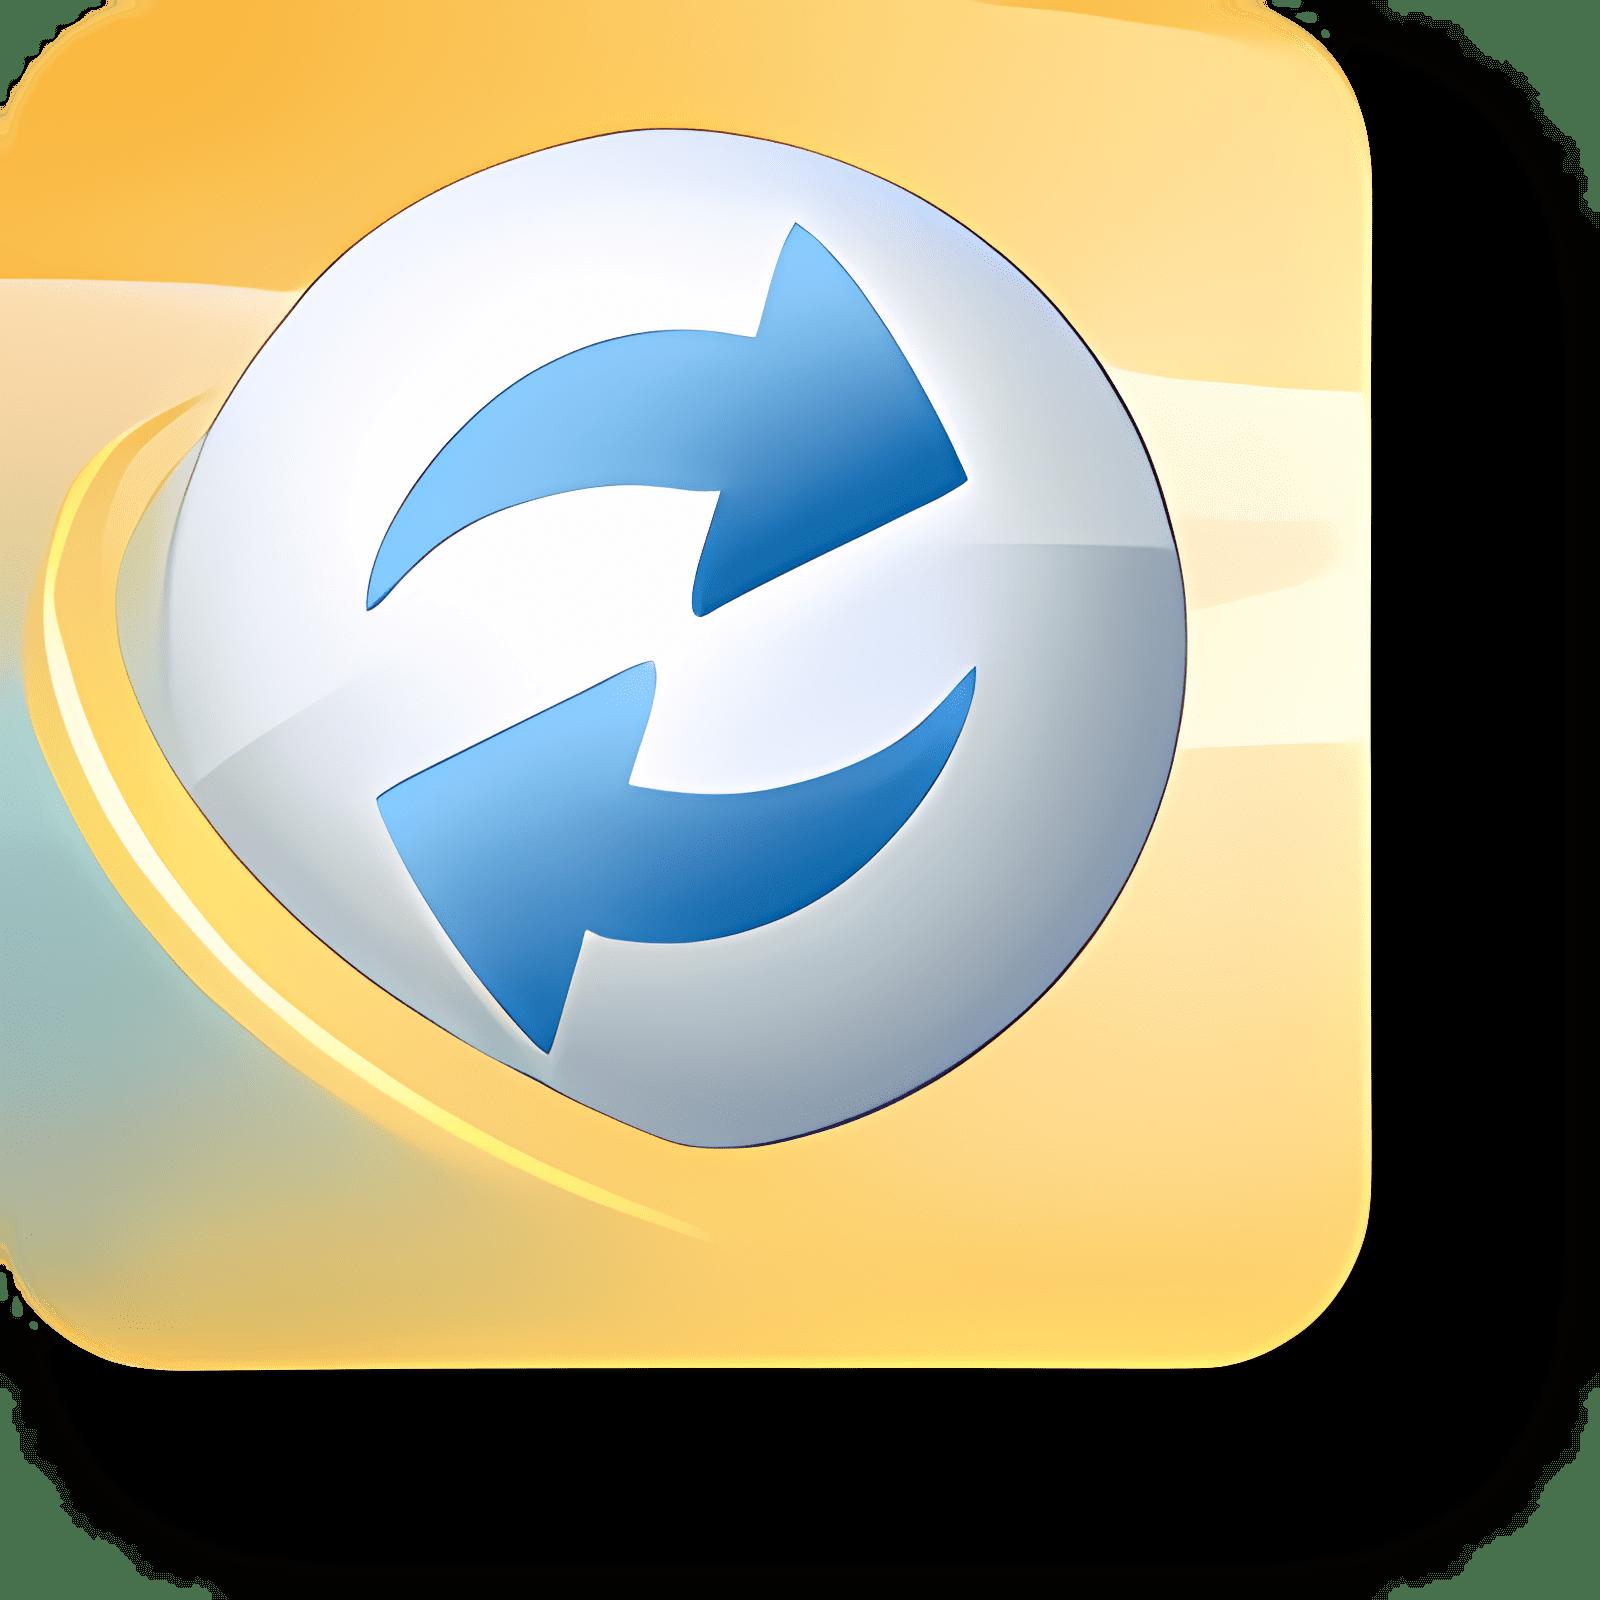 Windows Live Mesh 2011 15.4.3555.308